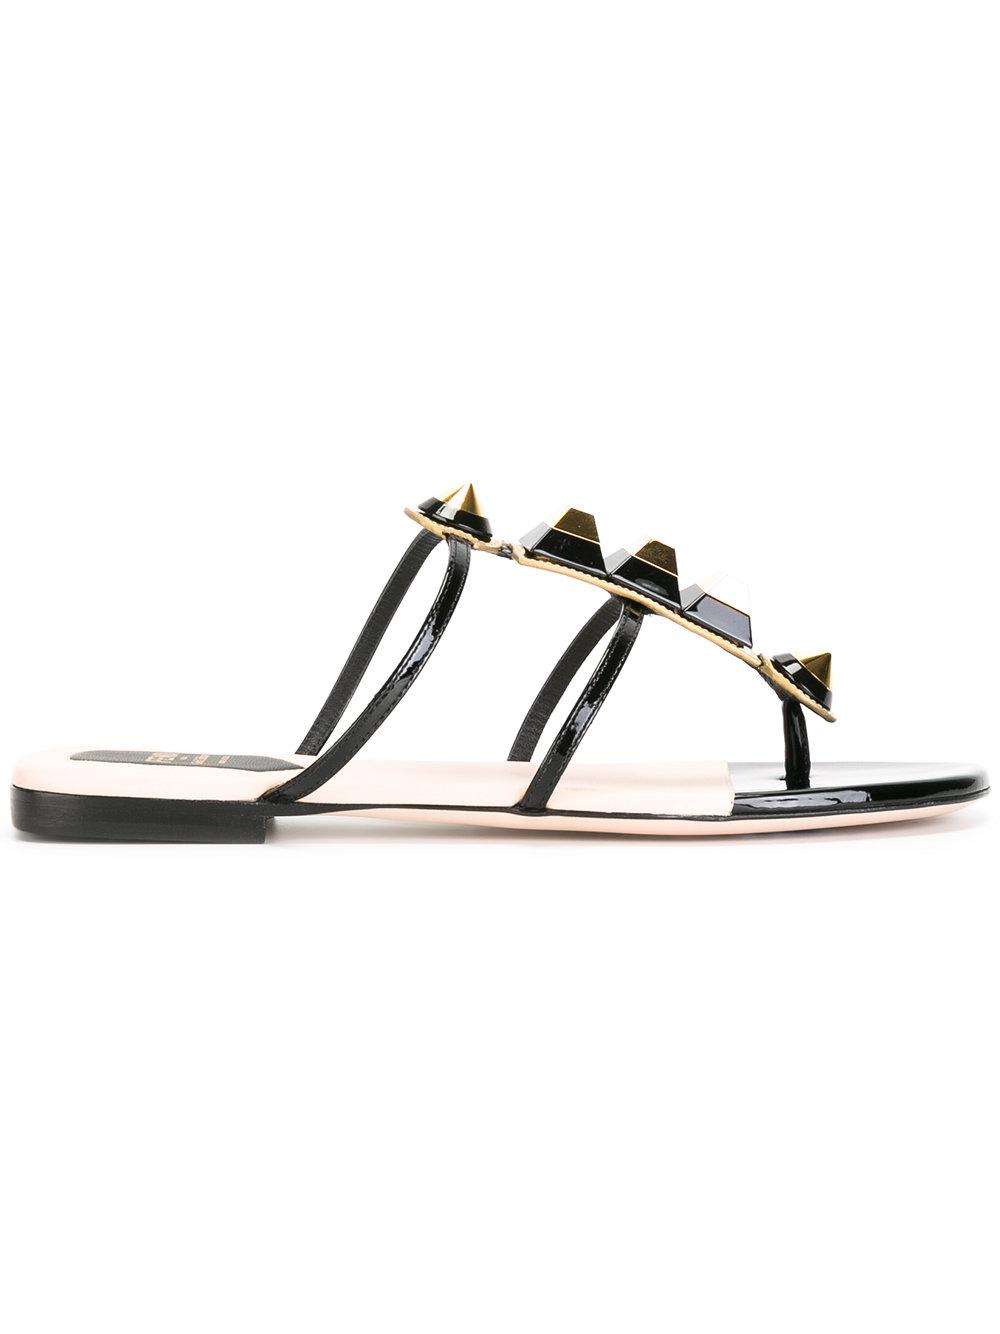 FENDI - studded T-bar sandals  $650